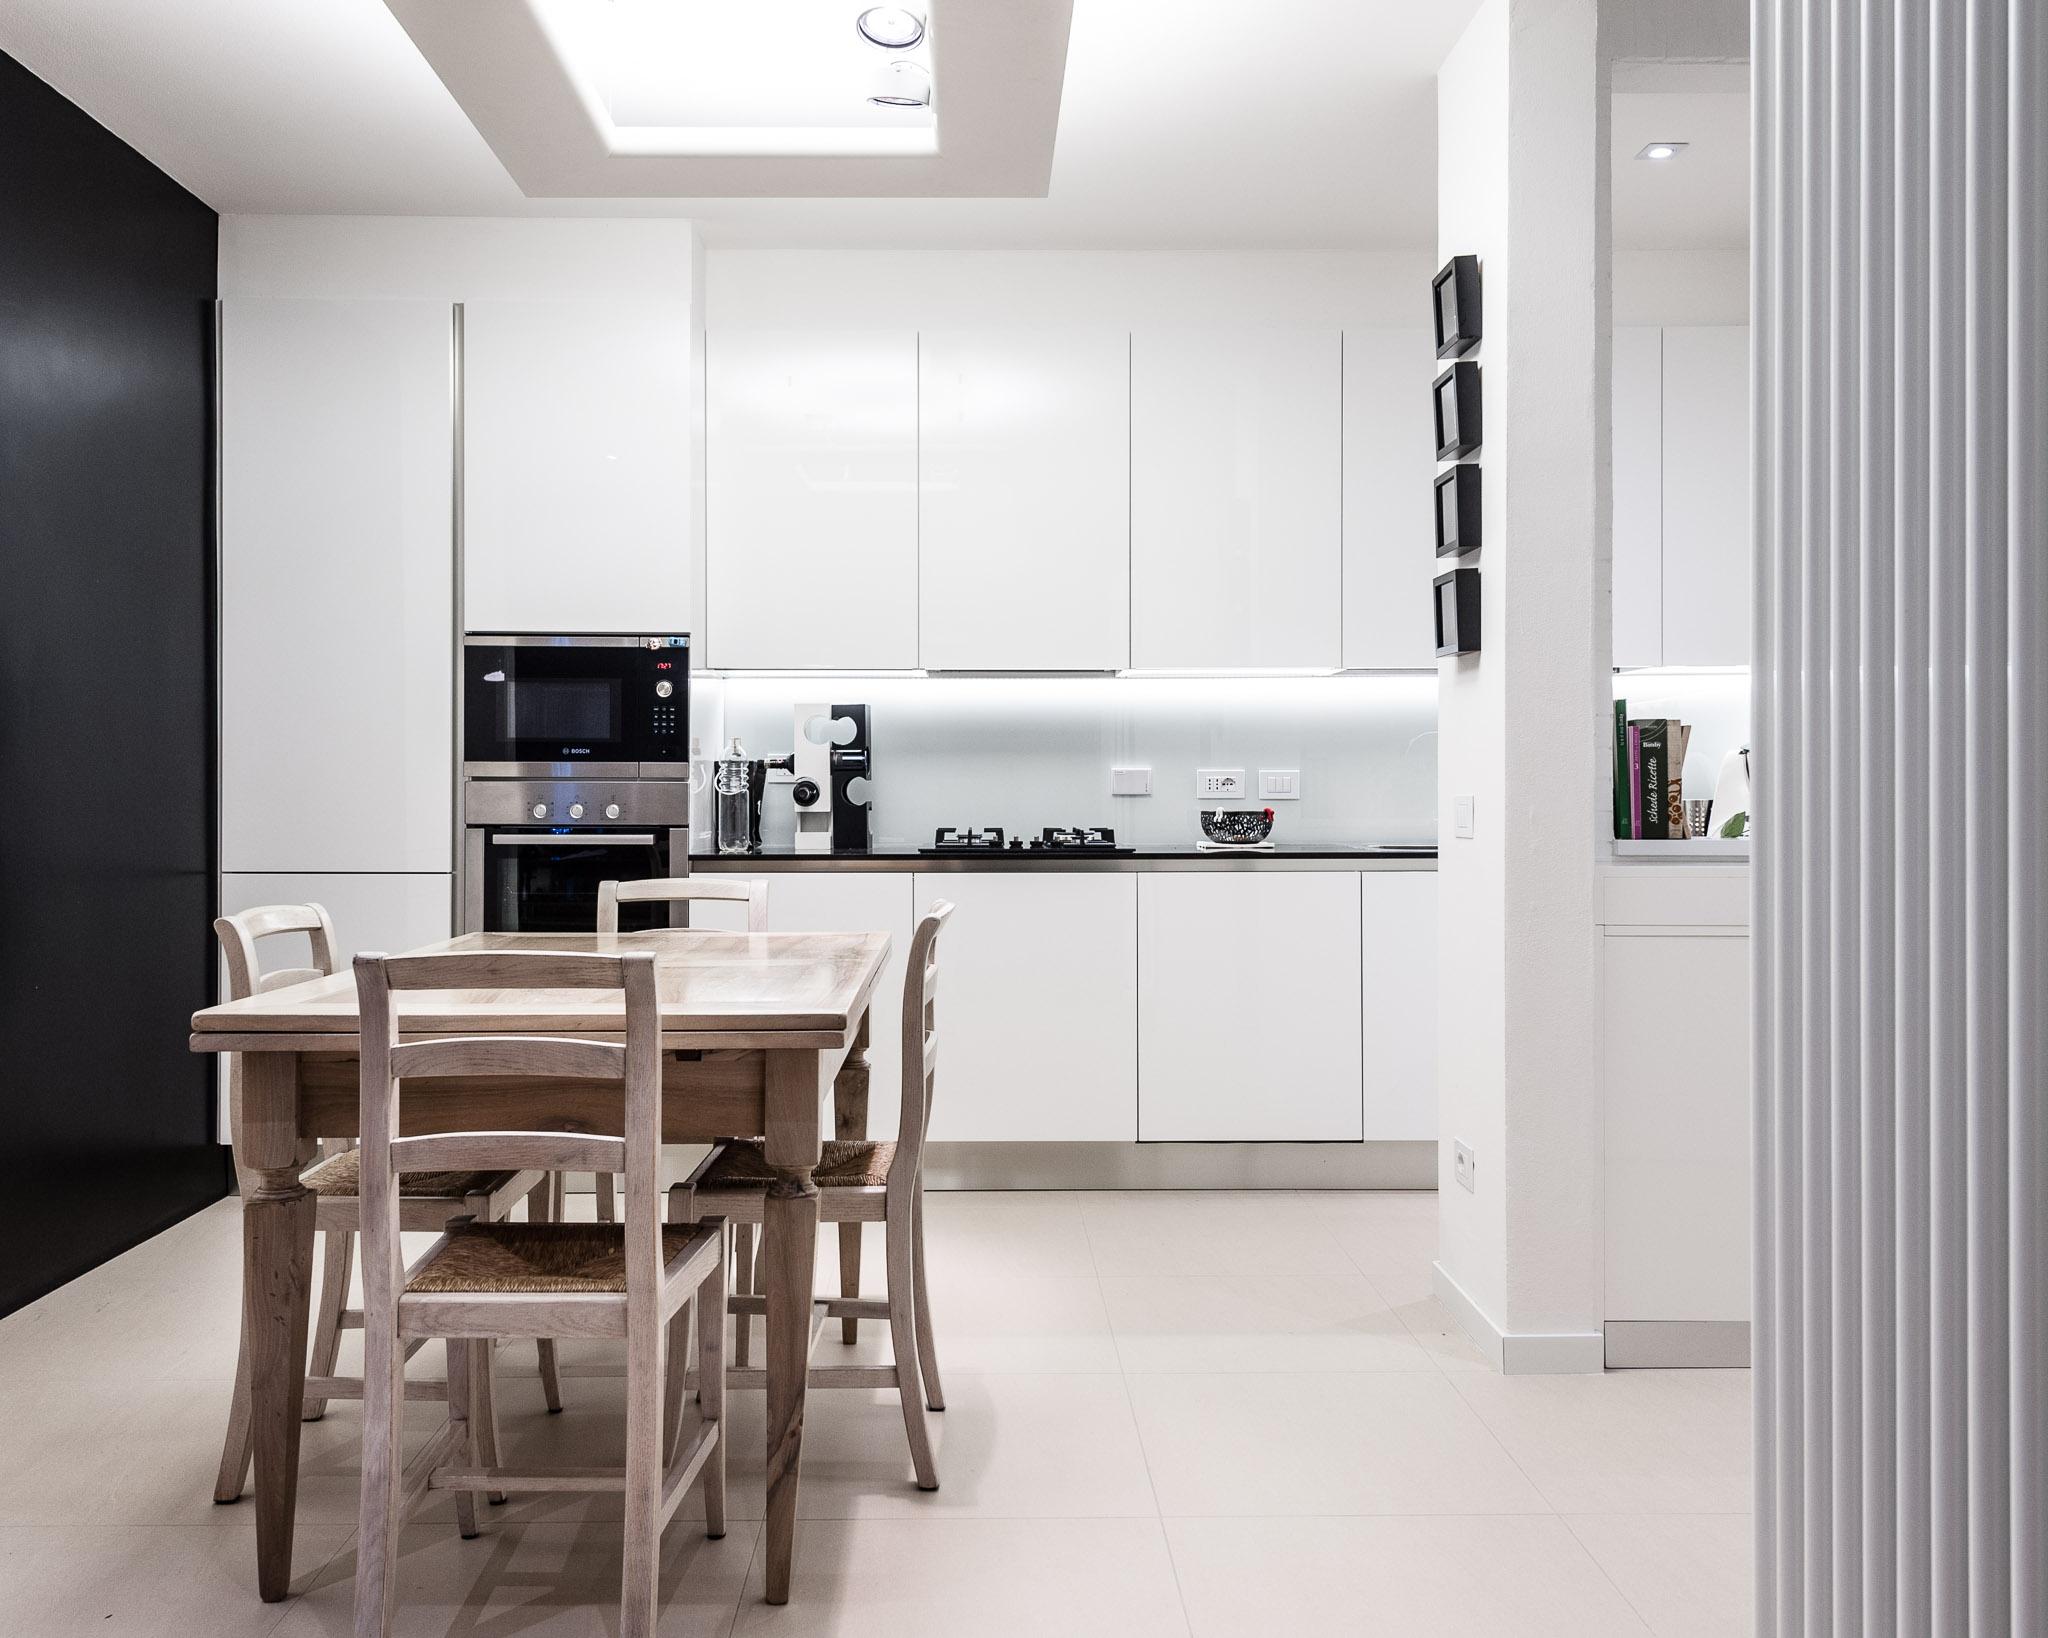 cannoni_house-6169